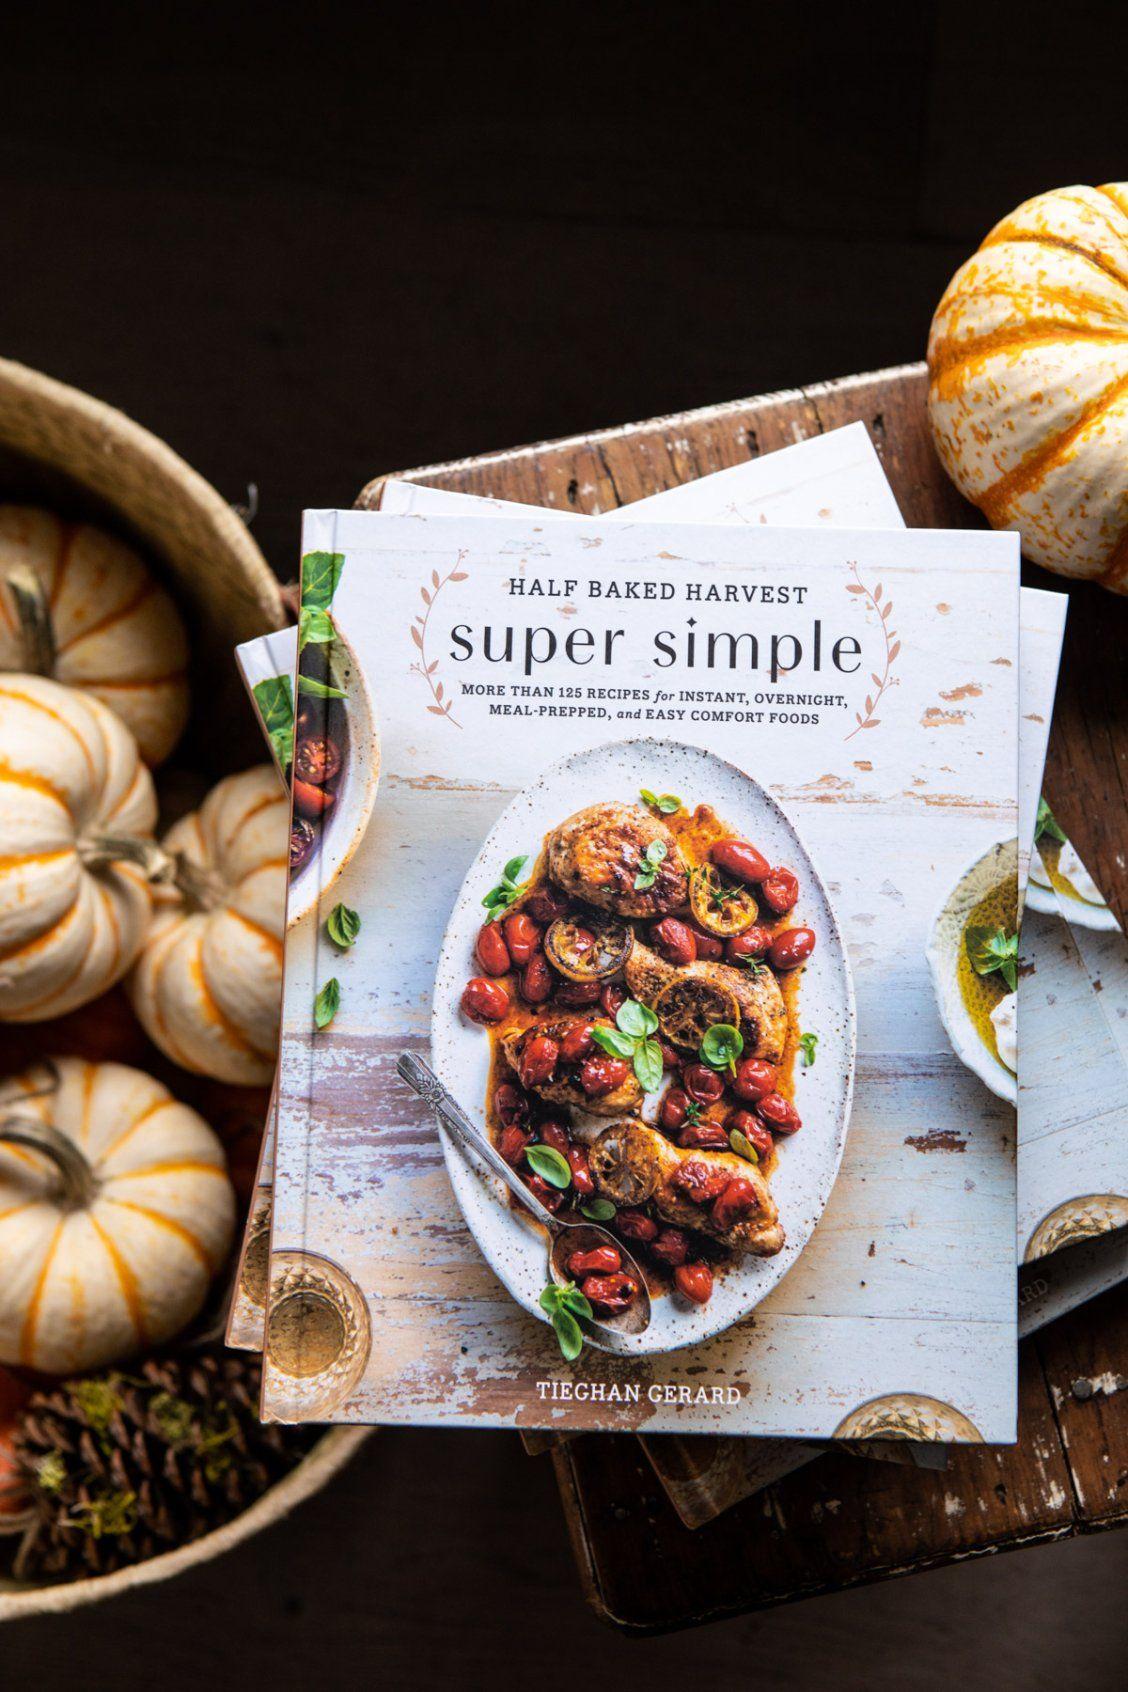 Half Baked Harvest Super Simple By Tieghan Gerard 9780525577072 Penguinrandomhouse Com Books In 2021 Chicken Tikka Masala Tikka Masala Half Baked Harvest